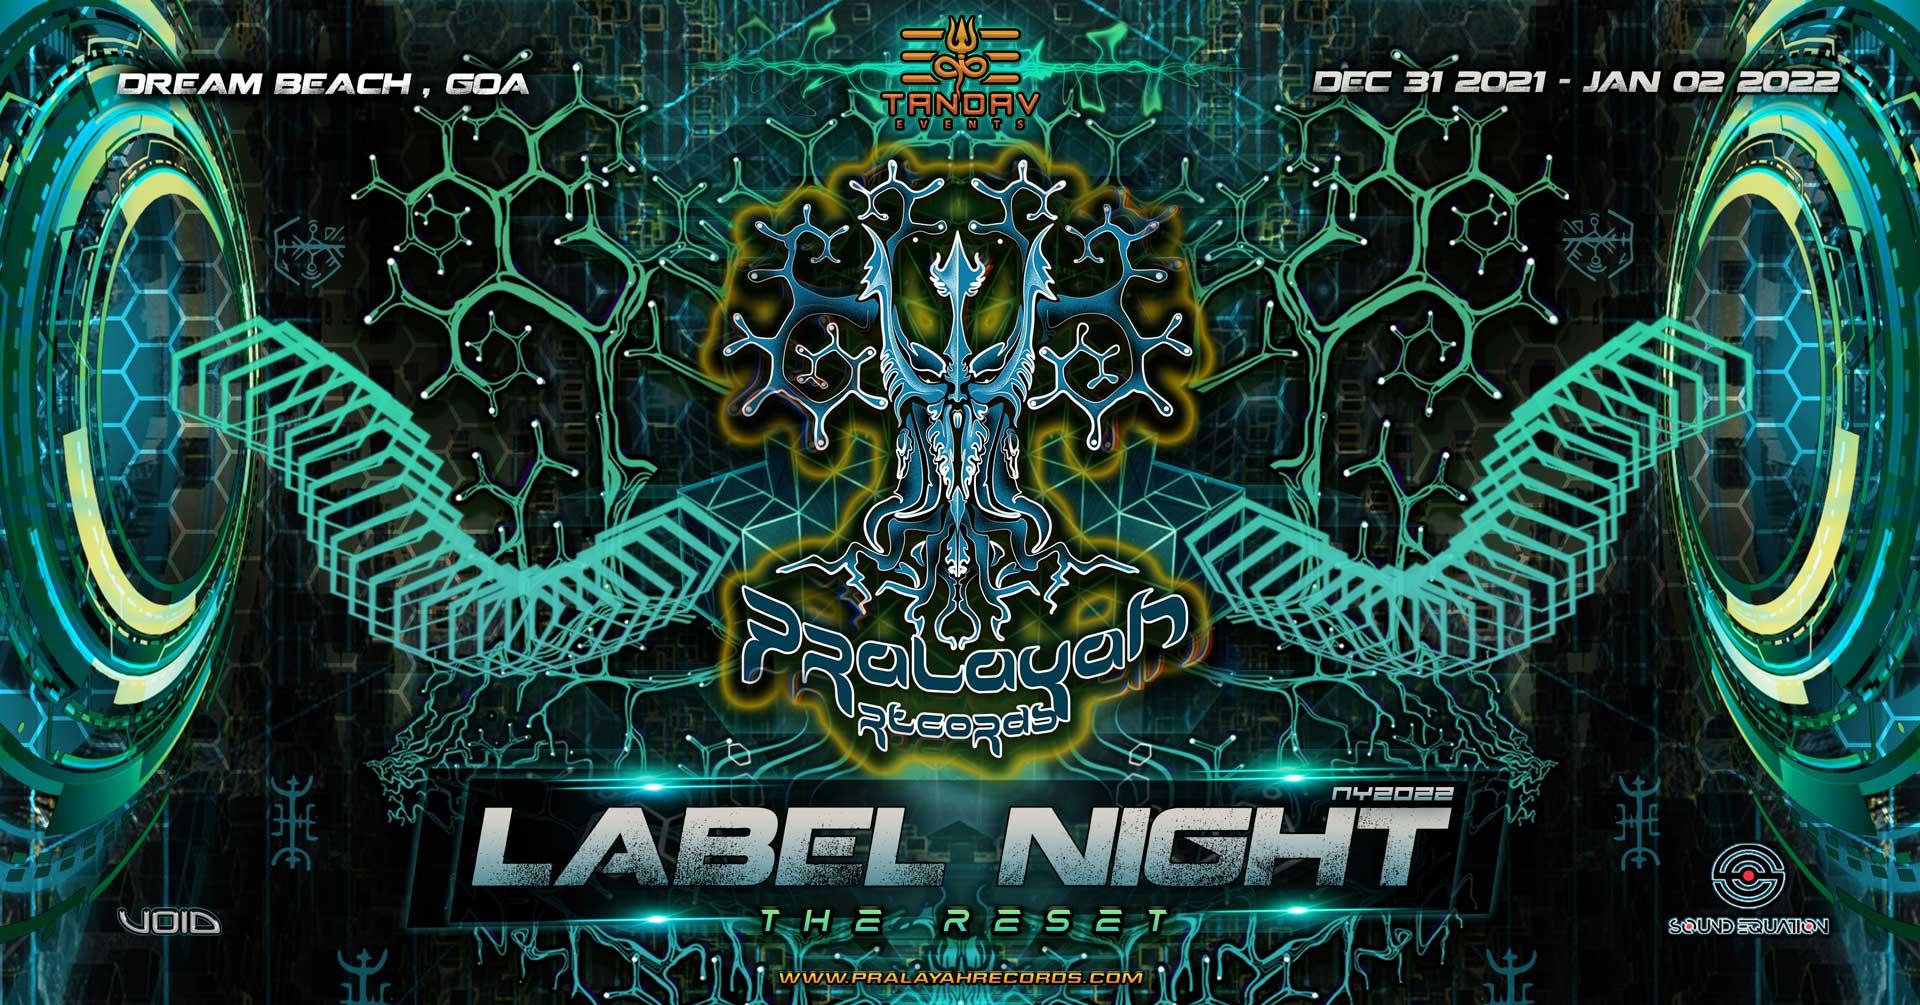 Label-Night